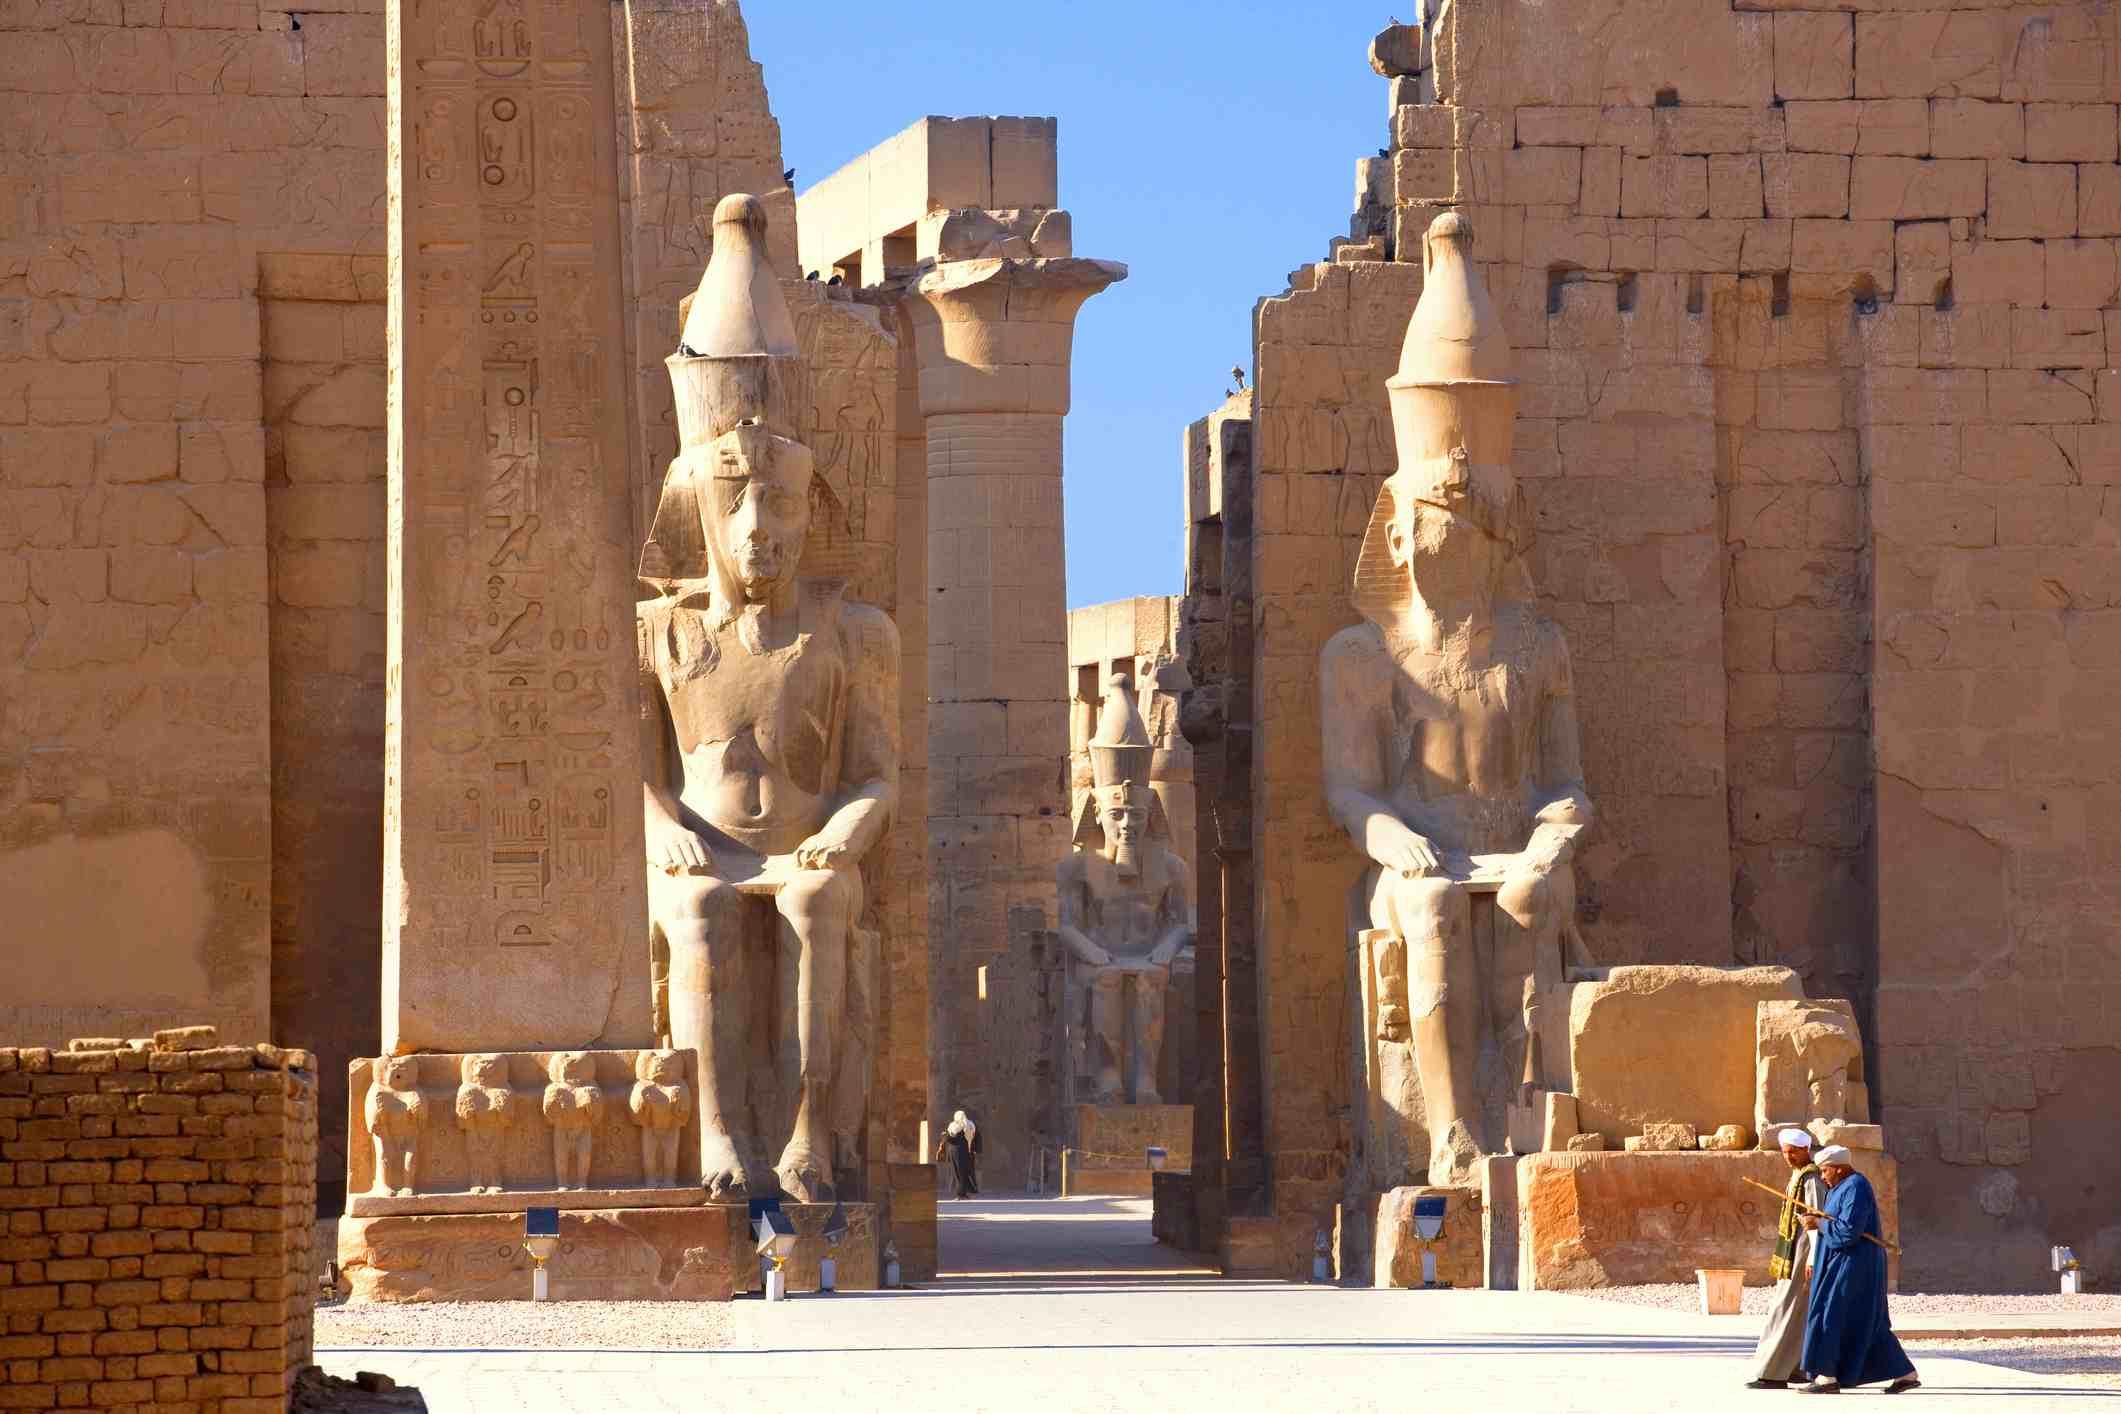 Temple of Luxor, Luxor